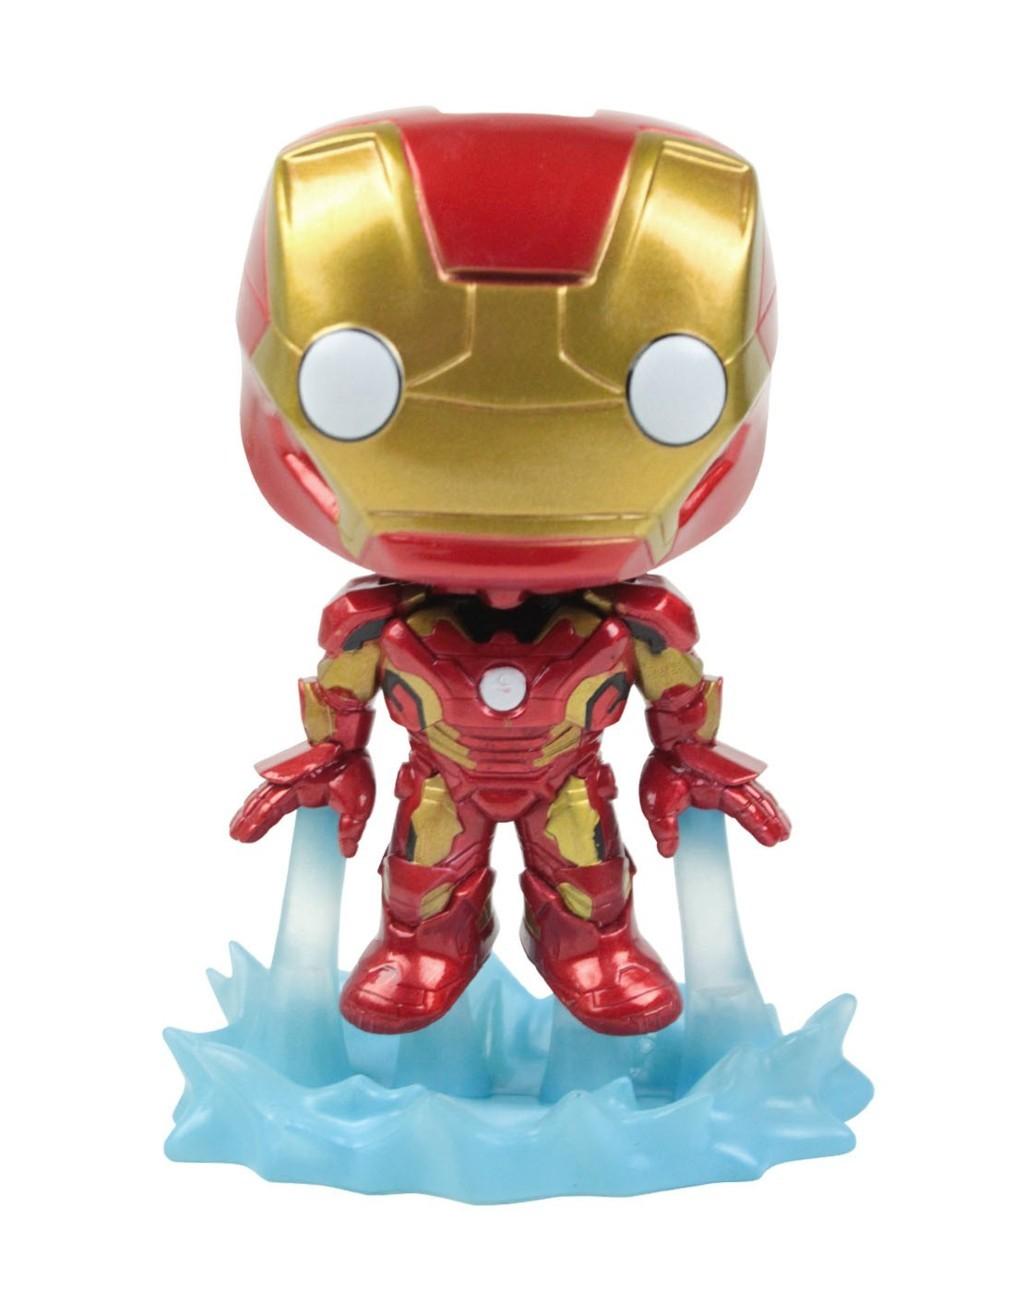 Iron Man / Homem de Ferro - Funko Pop Avengers: Age of Ultron